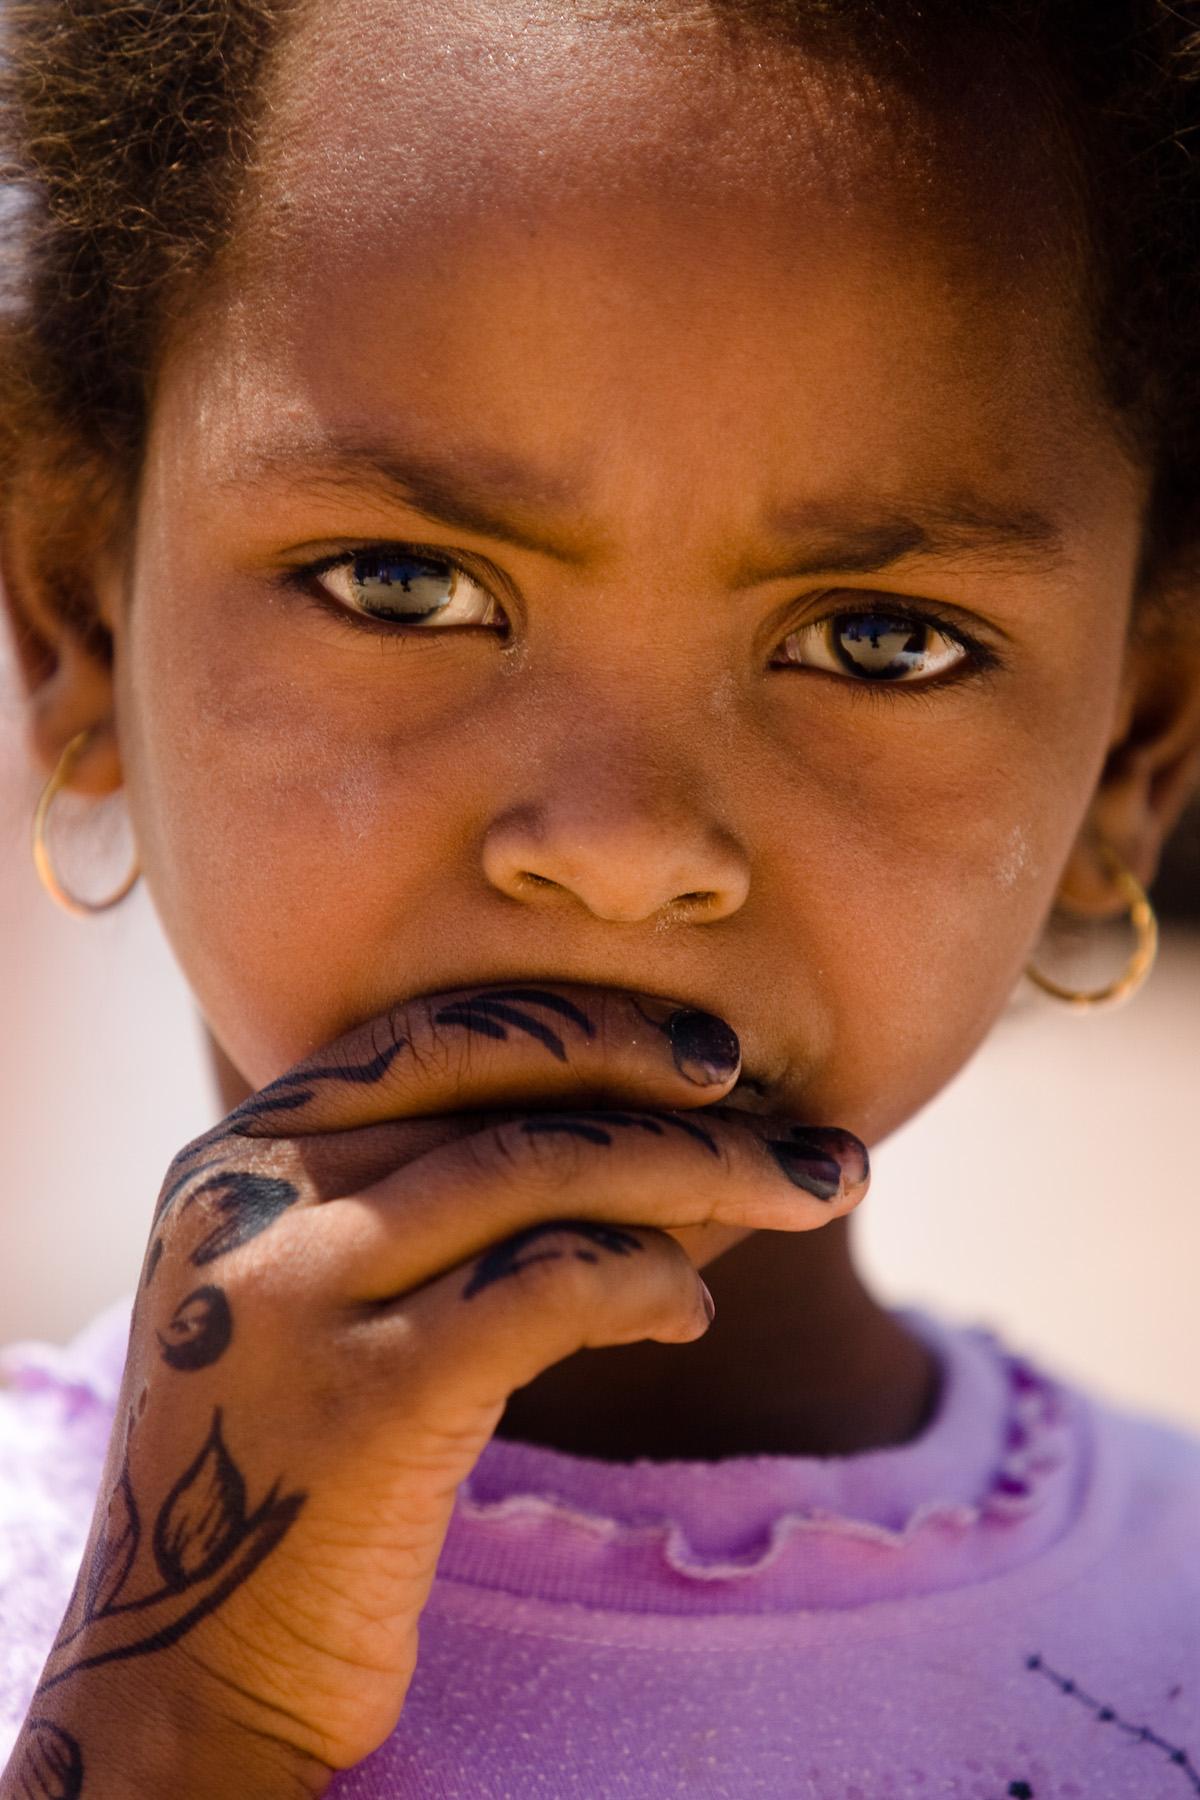 Nubian girl, Aswan